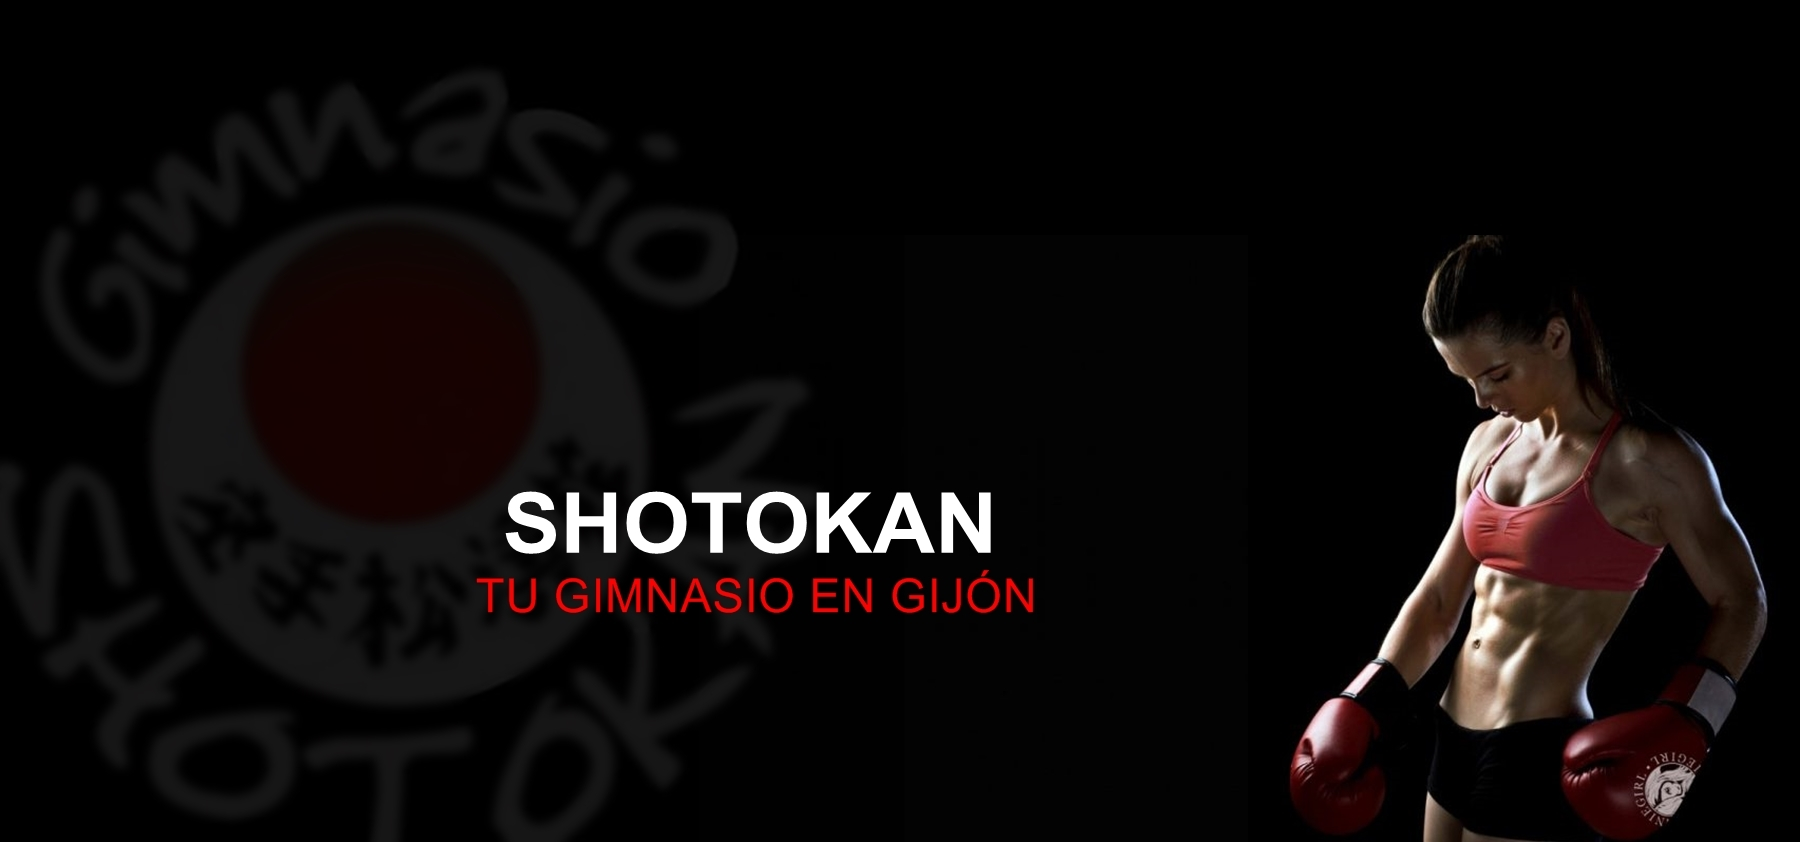 Gimnasio Shotokan - Salud y Bienestar -  Tu gimnasio en Gijón